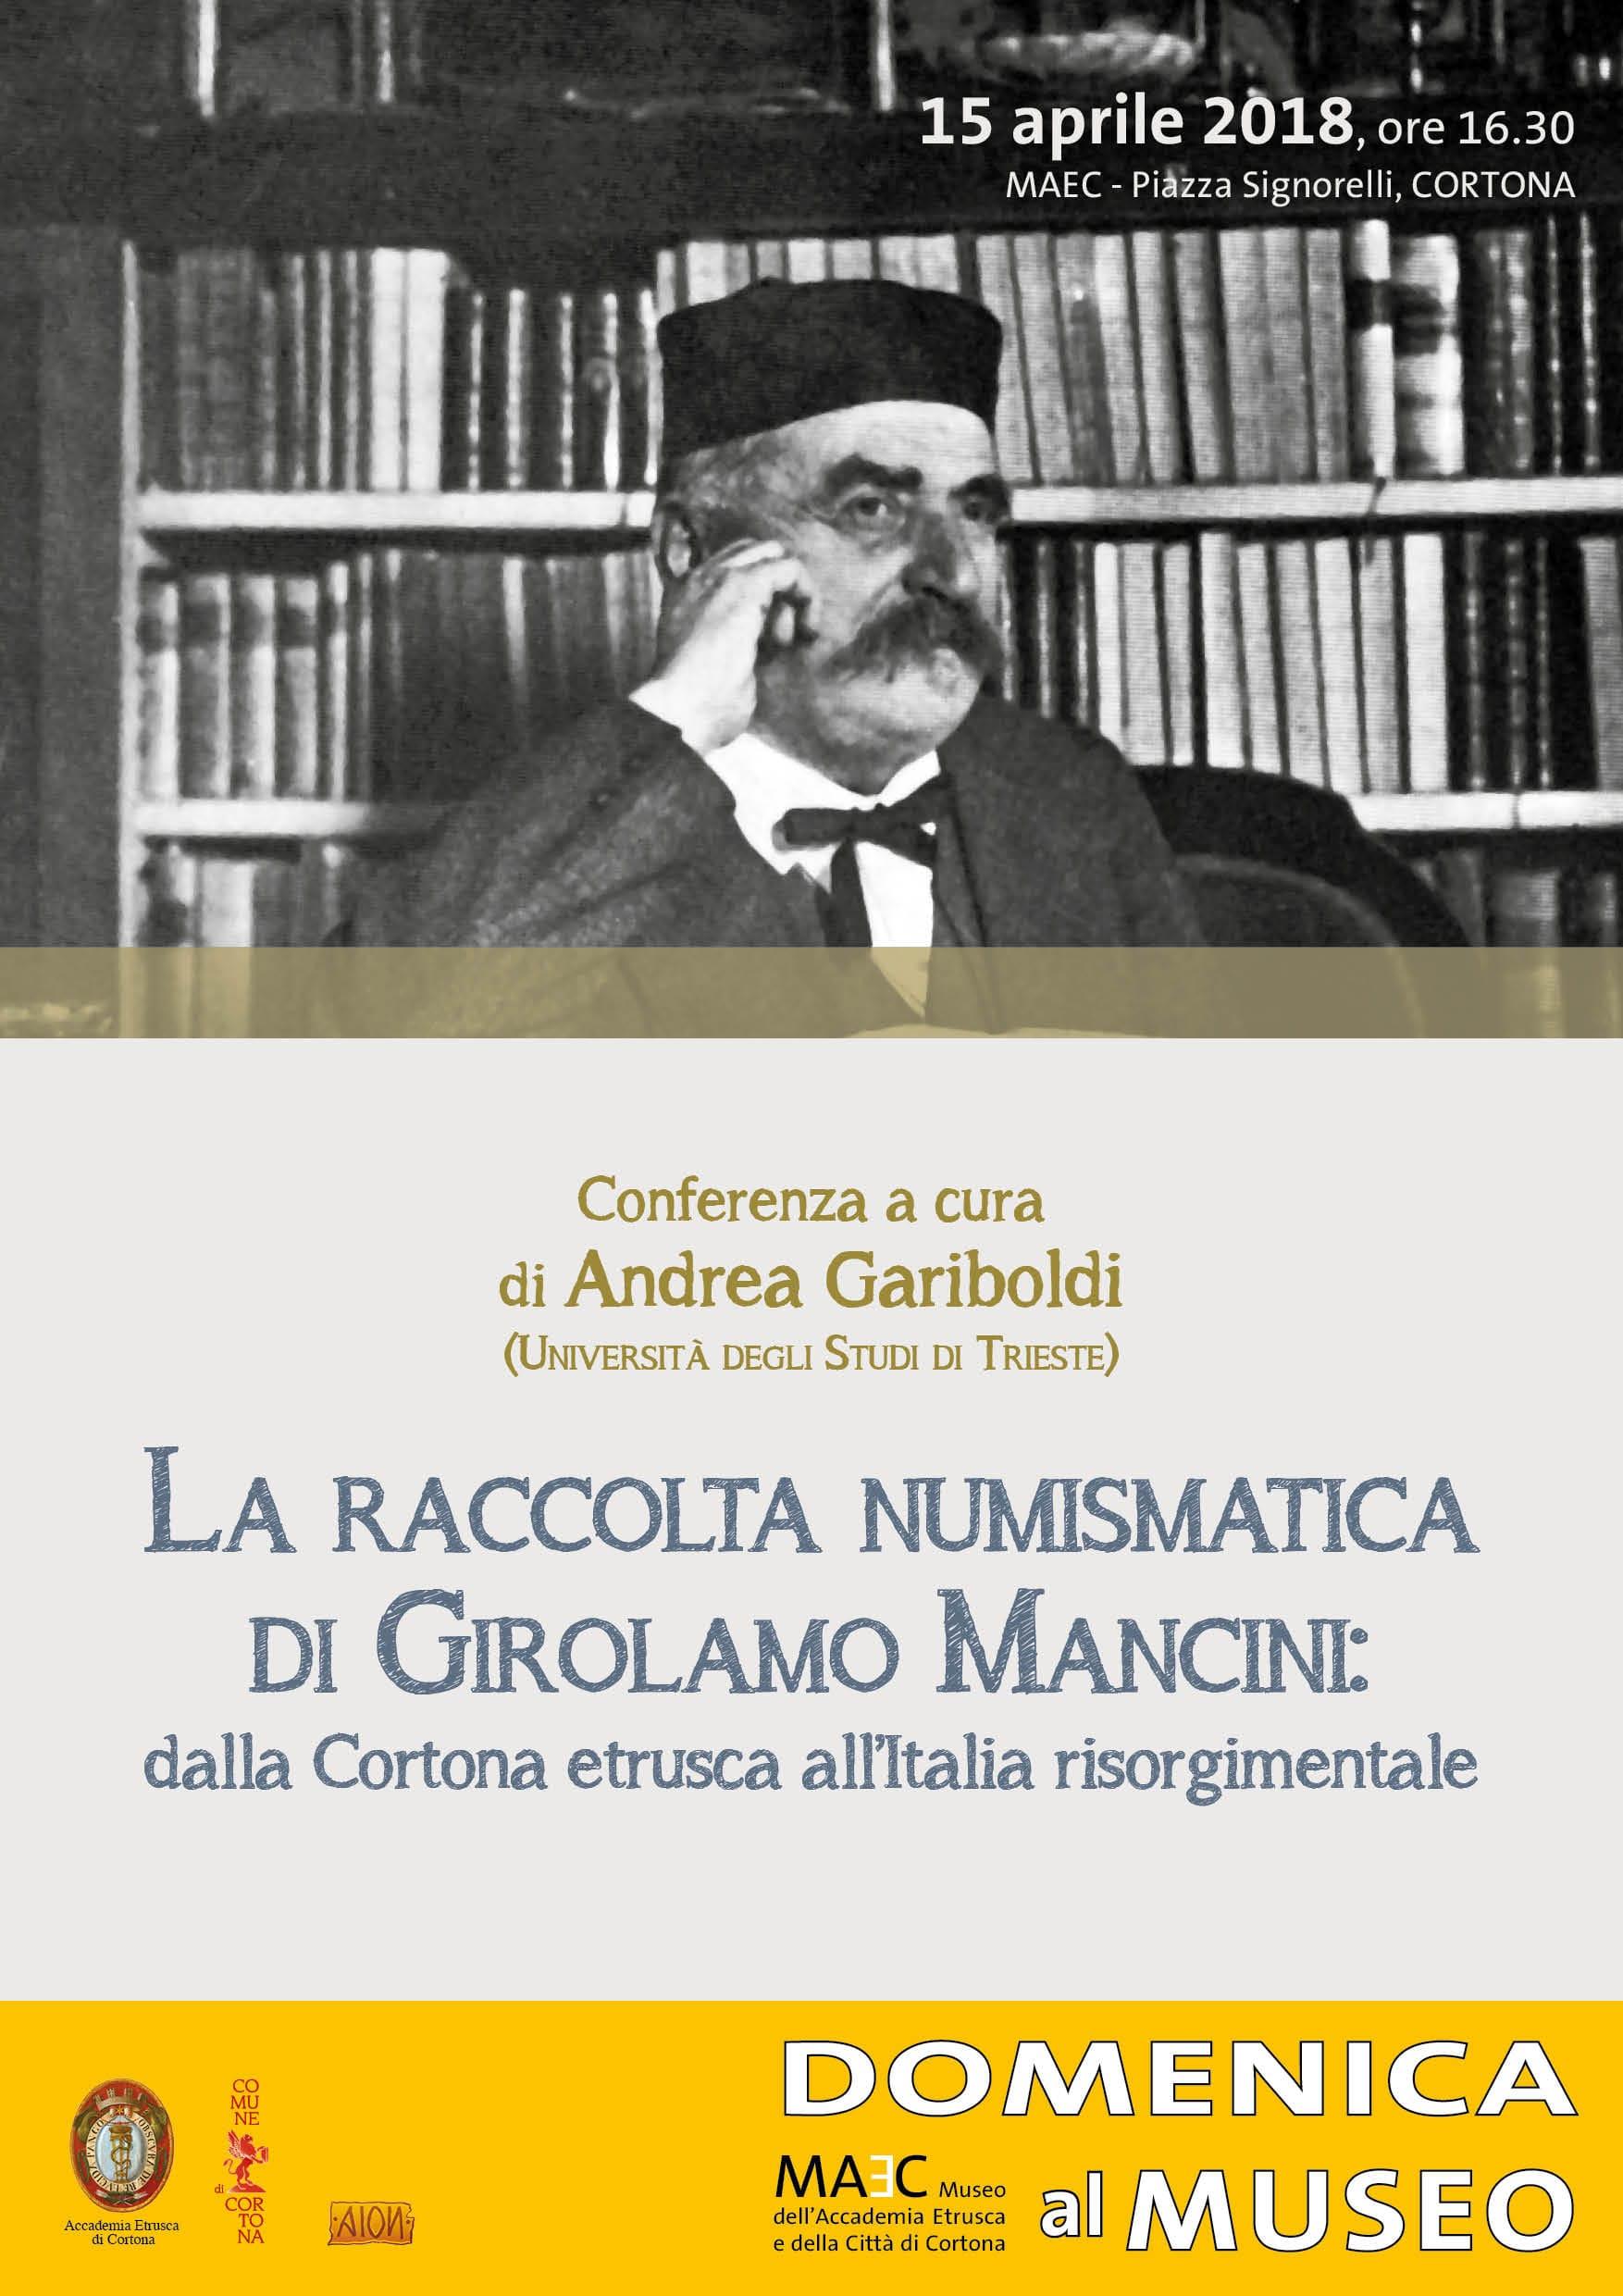 MAEC | La raccolta numismatica di Girolamo Mancini